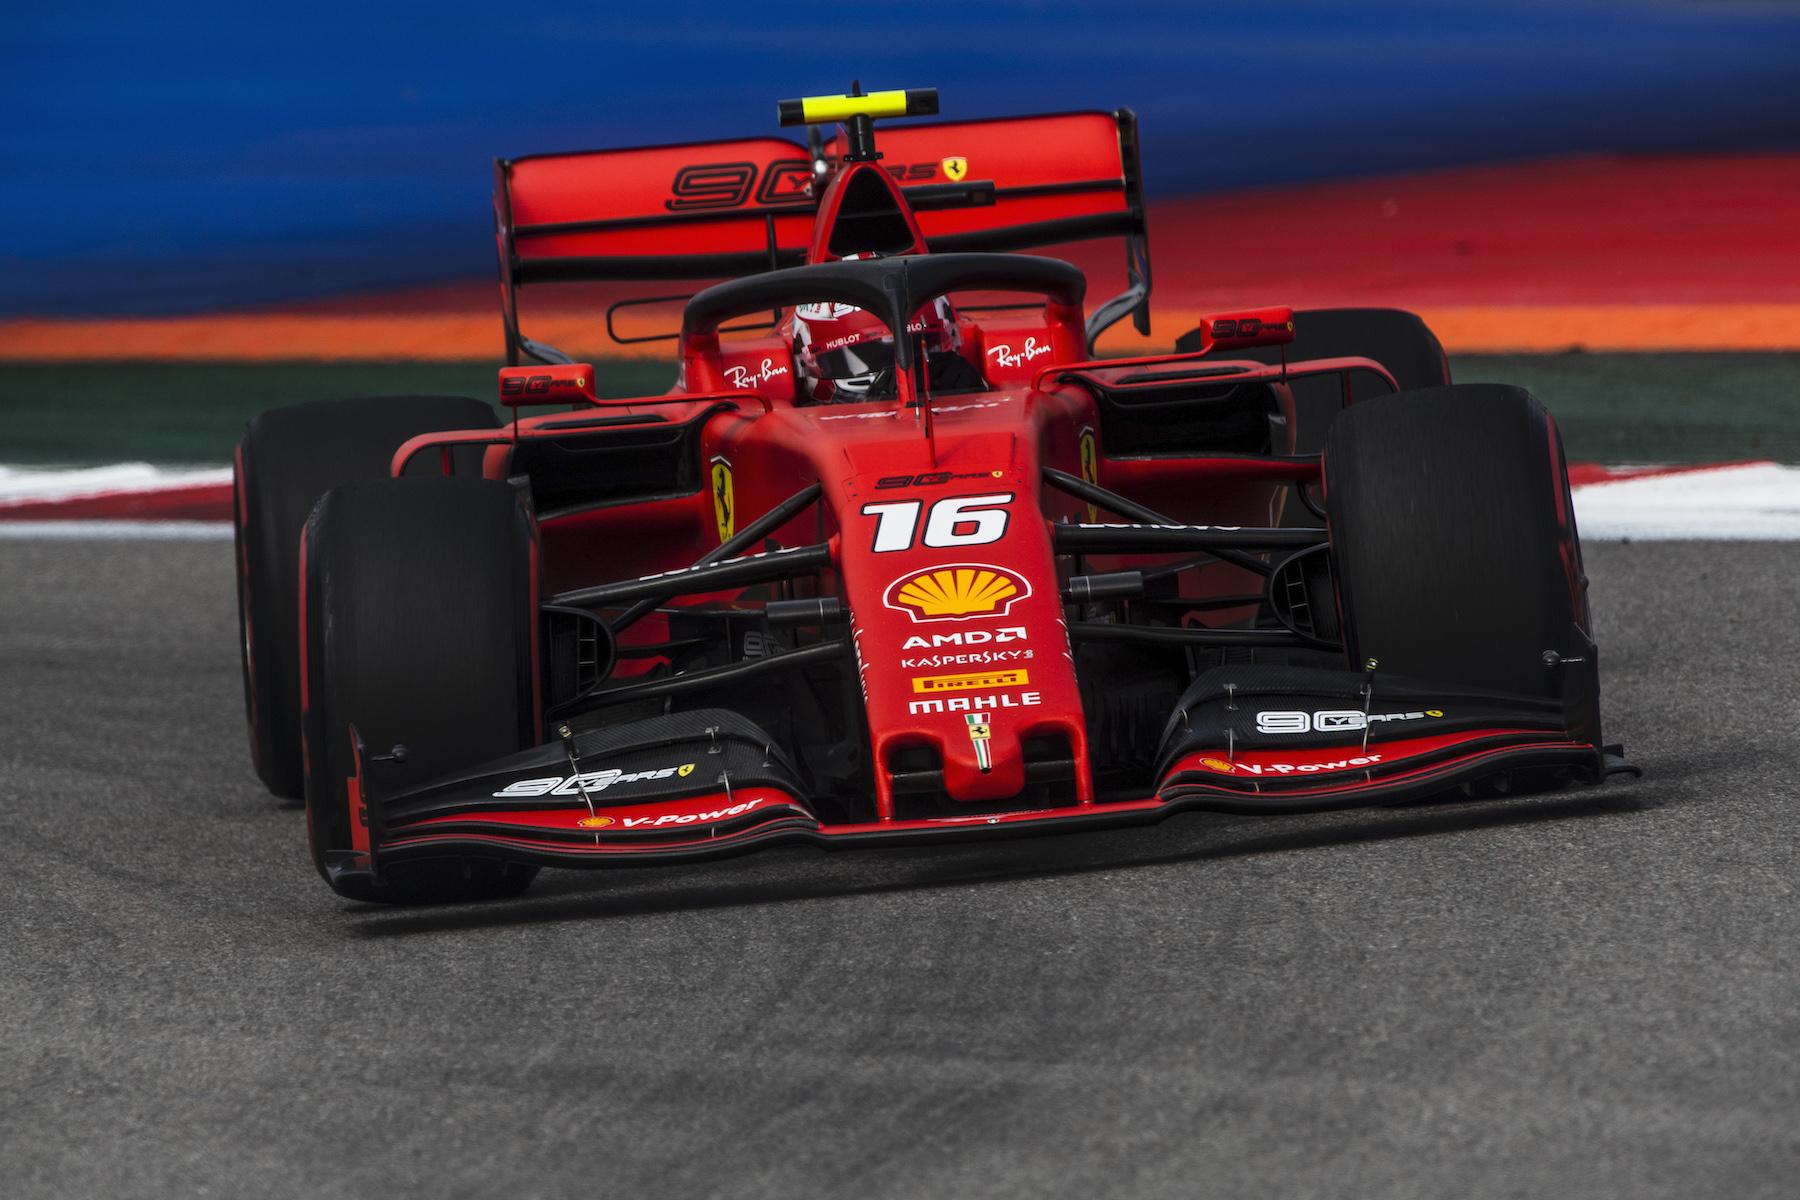 2 2019 Russian GP Friday 31.jpg